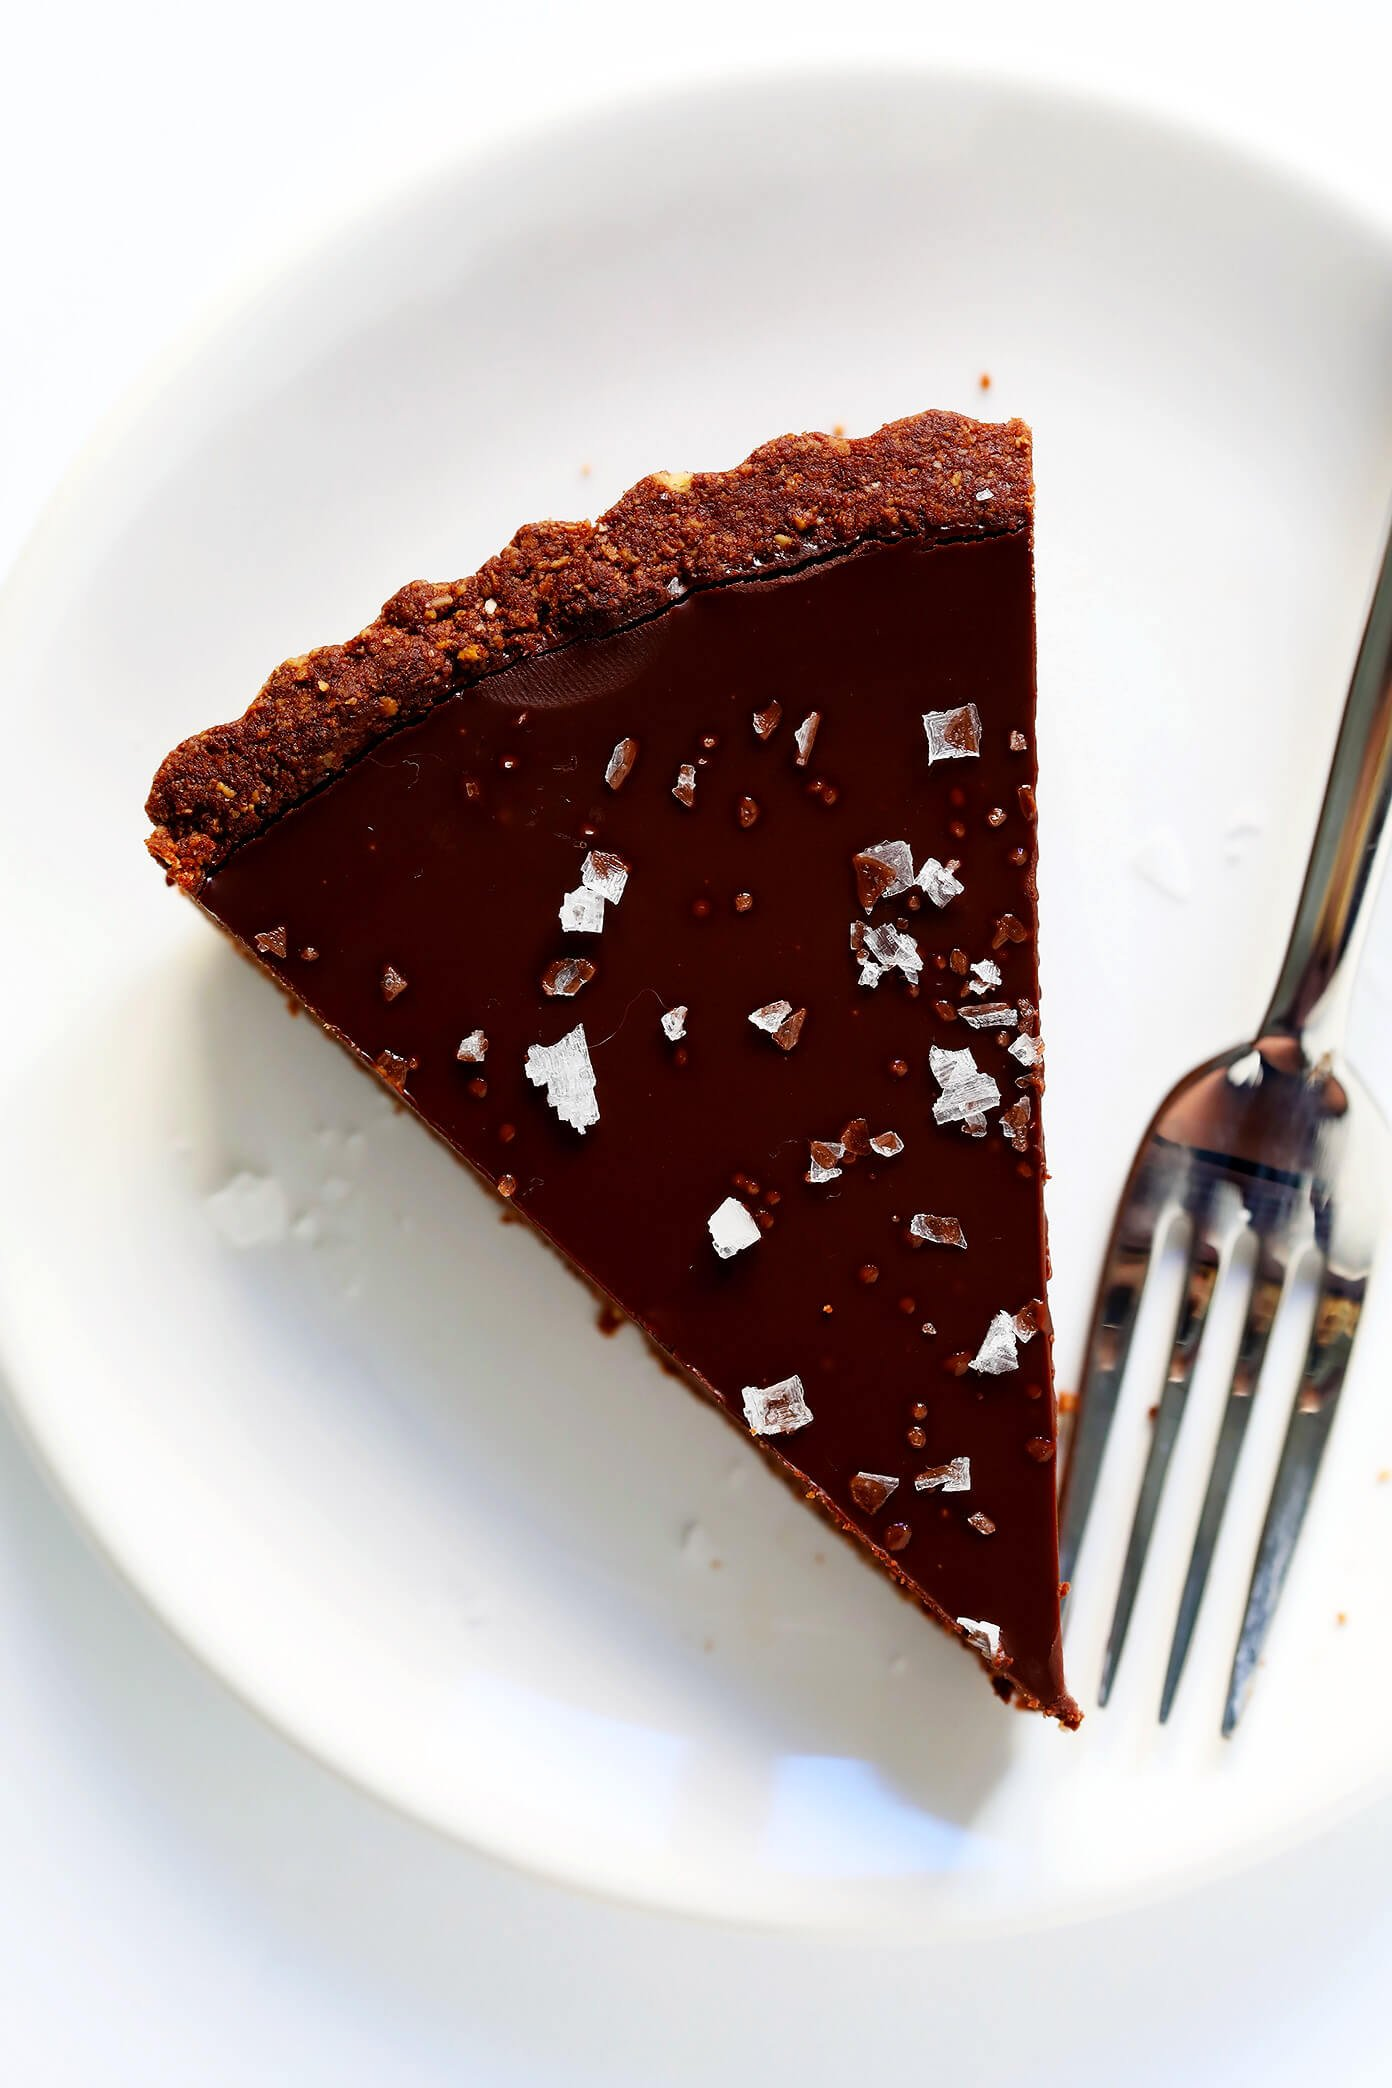 Piece of Salted Dark Chocolate Tart on plate